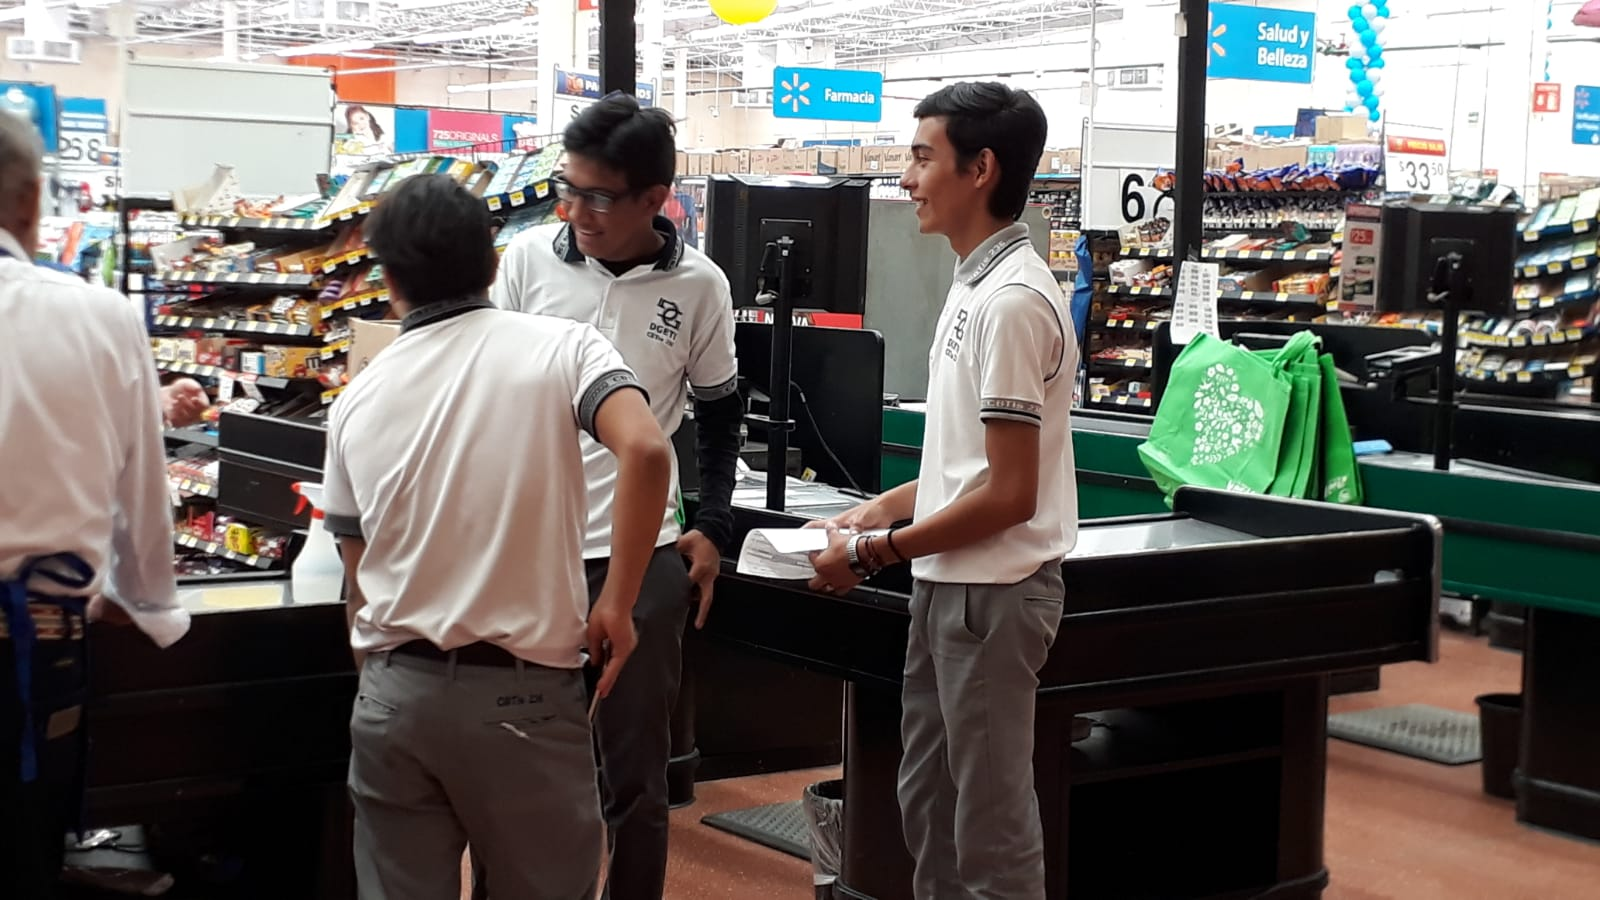 becas-benito-juarez-donde-cobrar-beca-bienestar-azteca1